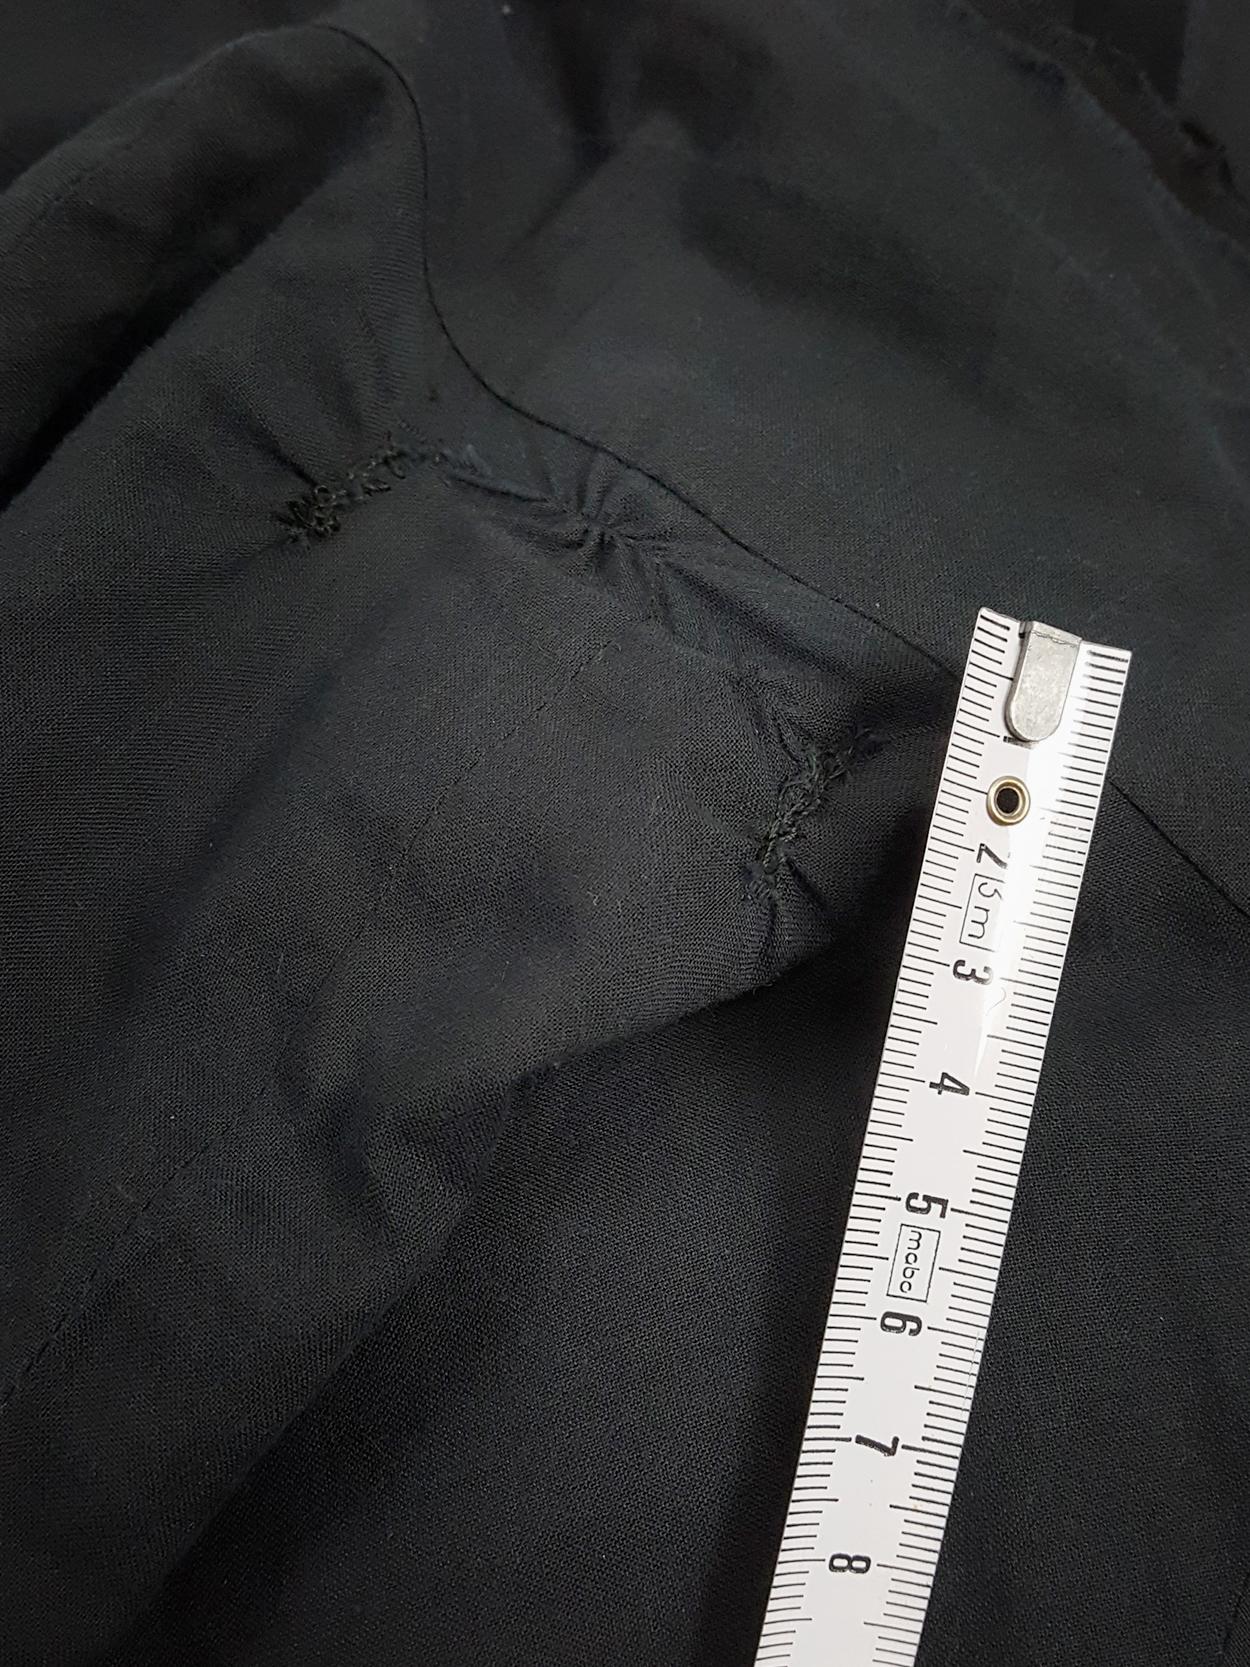 Comme des Garçons blue triple-layered blazer with cutaway hem — AD 1997